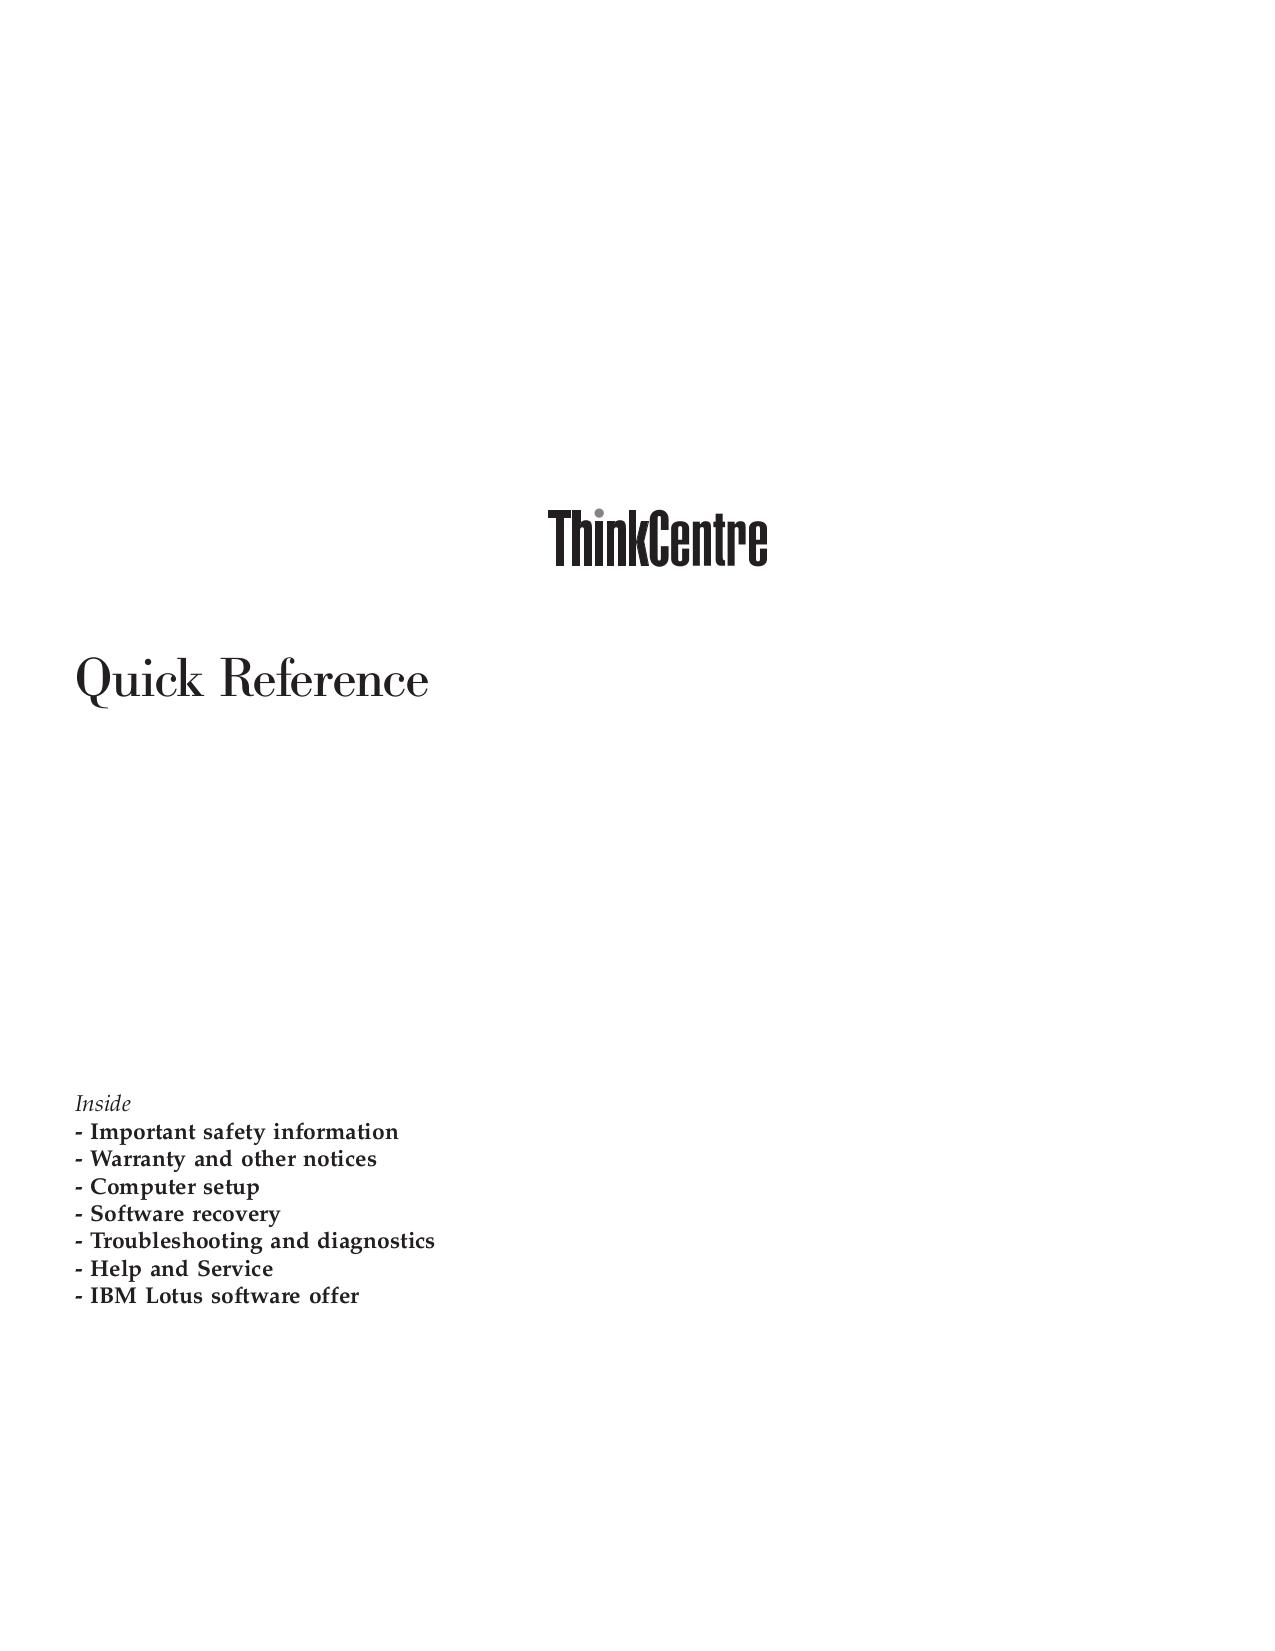 pdf for Lenovo Desktop ThinkCentre E50 8292 manual